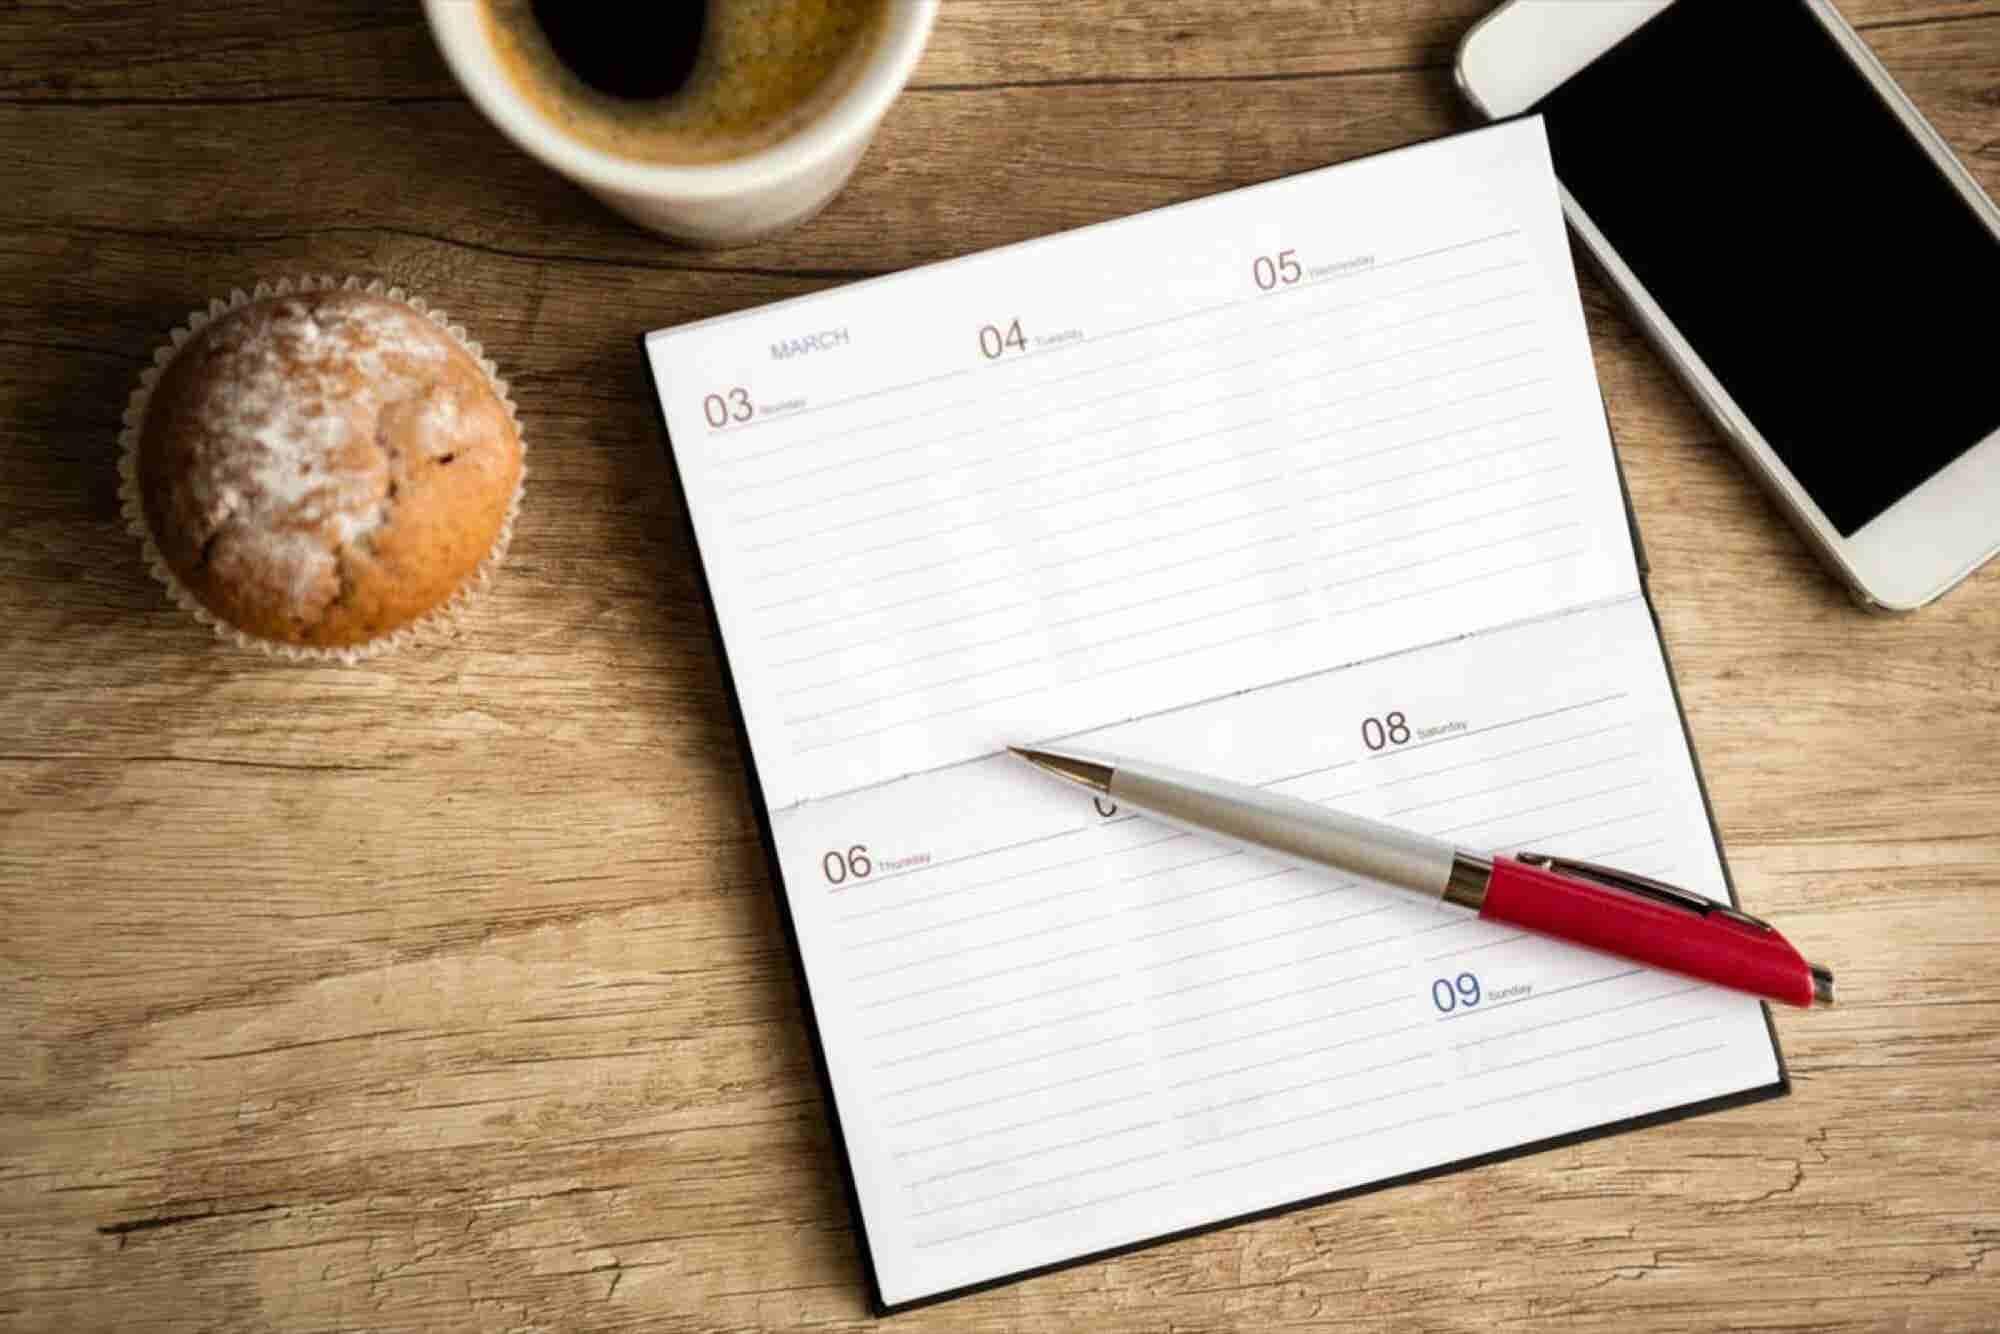 5 Hacks That Will Cut Your Workweek in Half